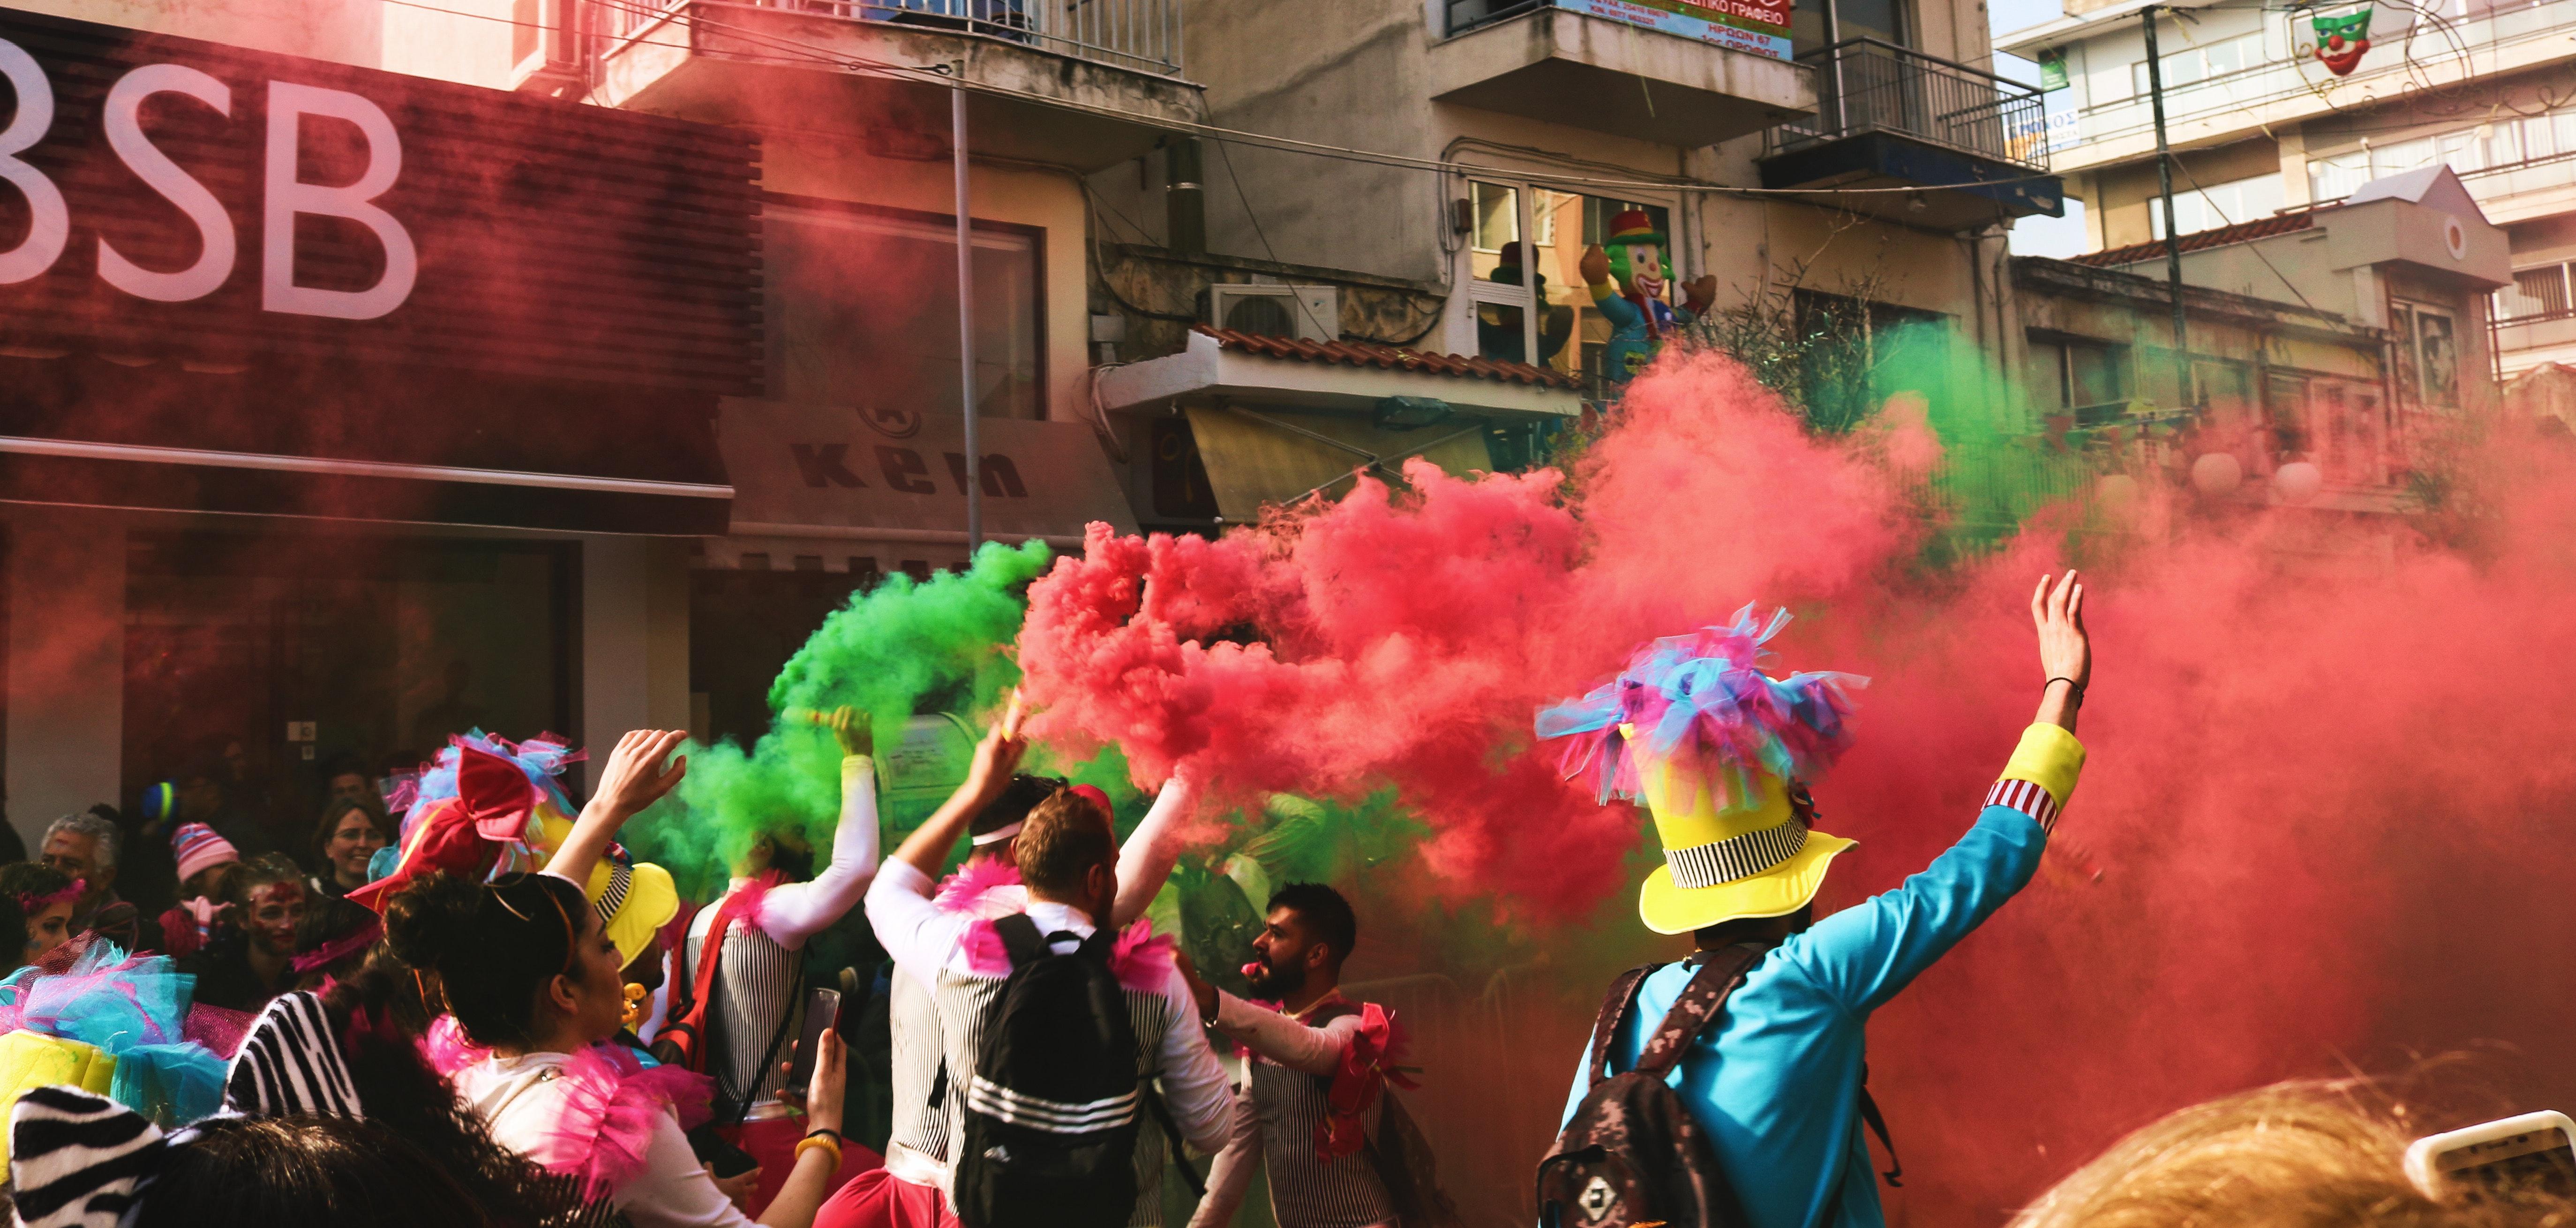 People spraying assorted color of smoke photo